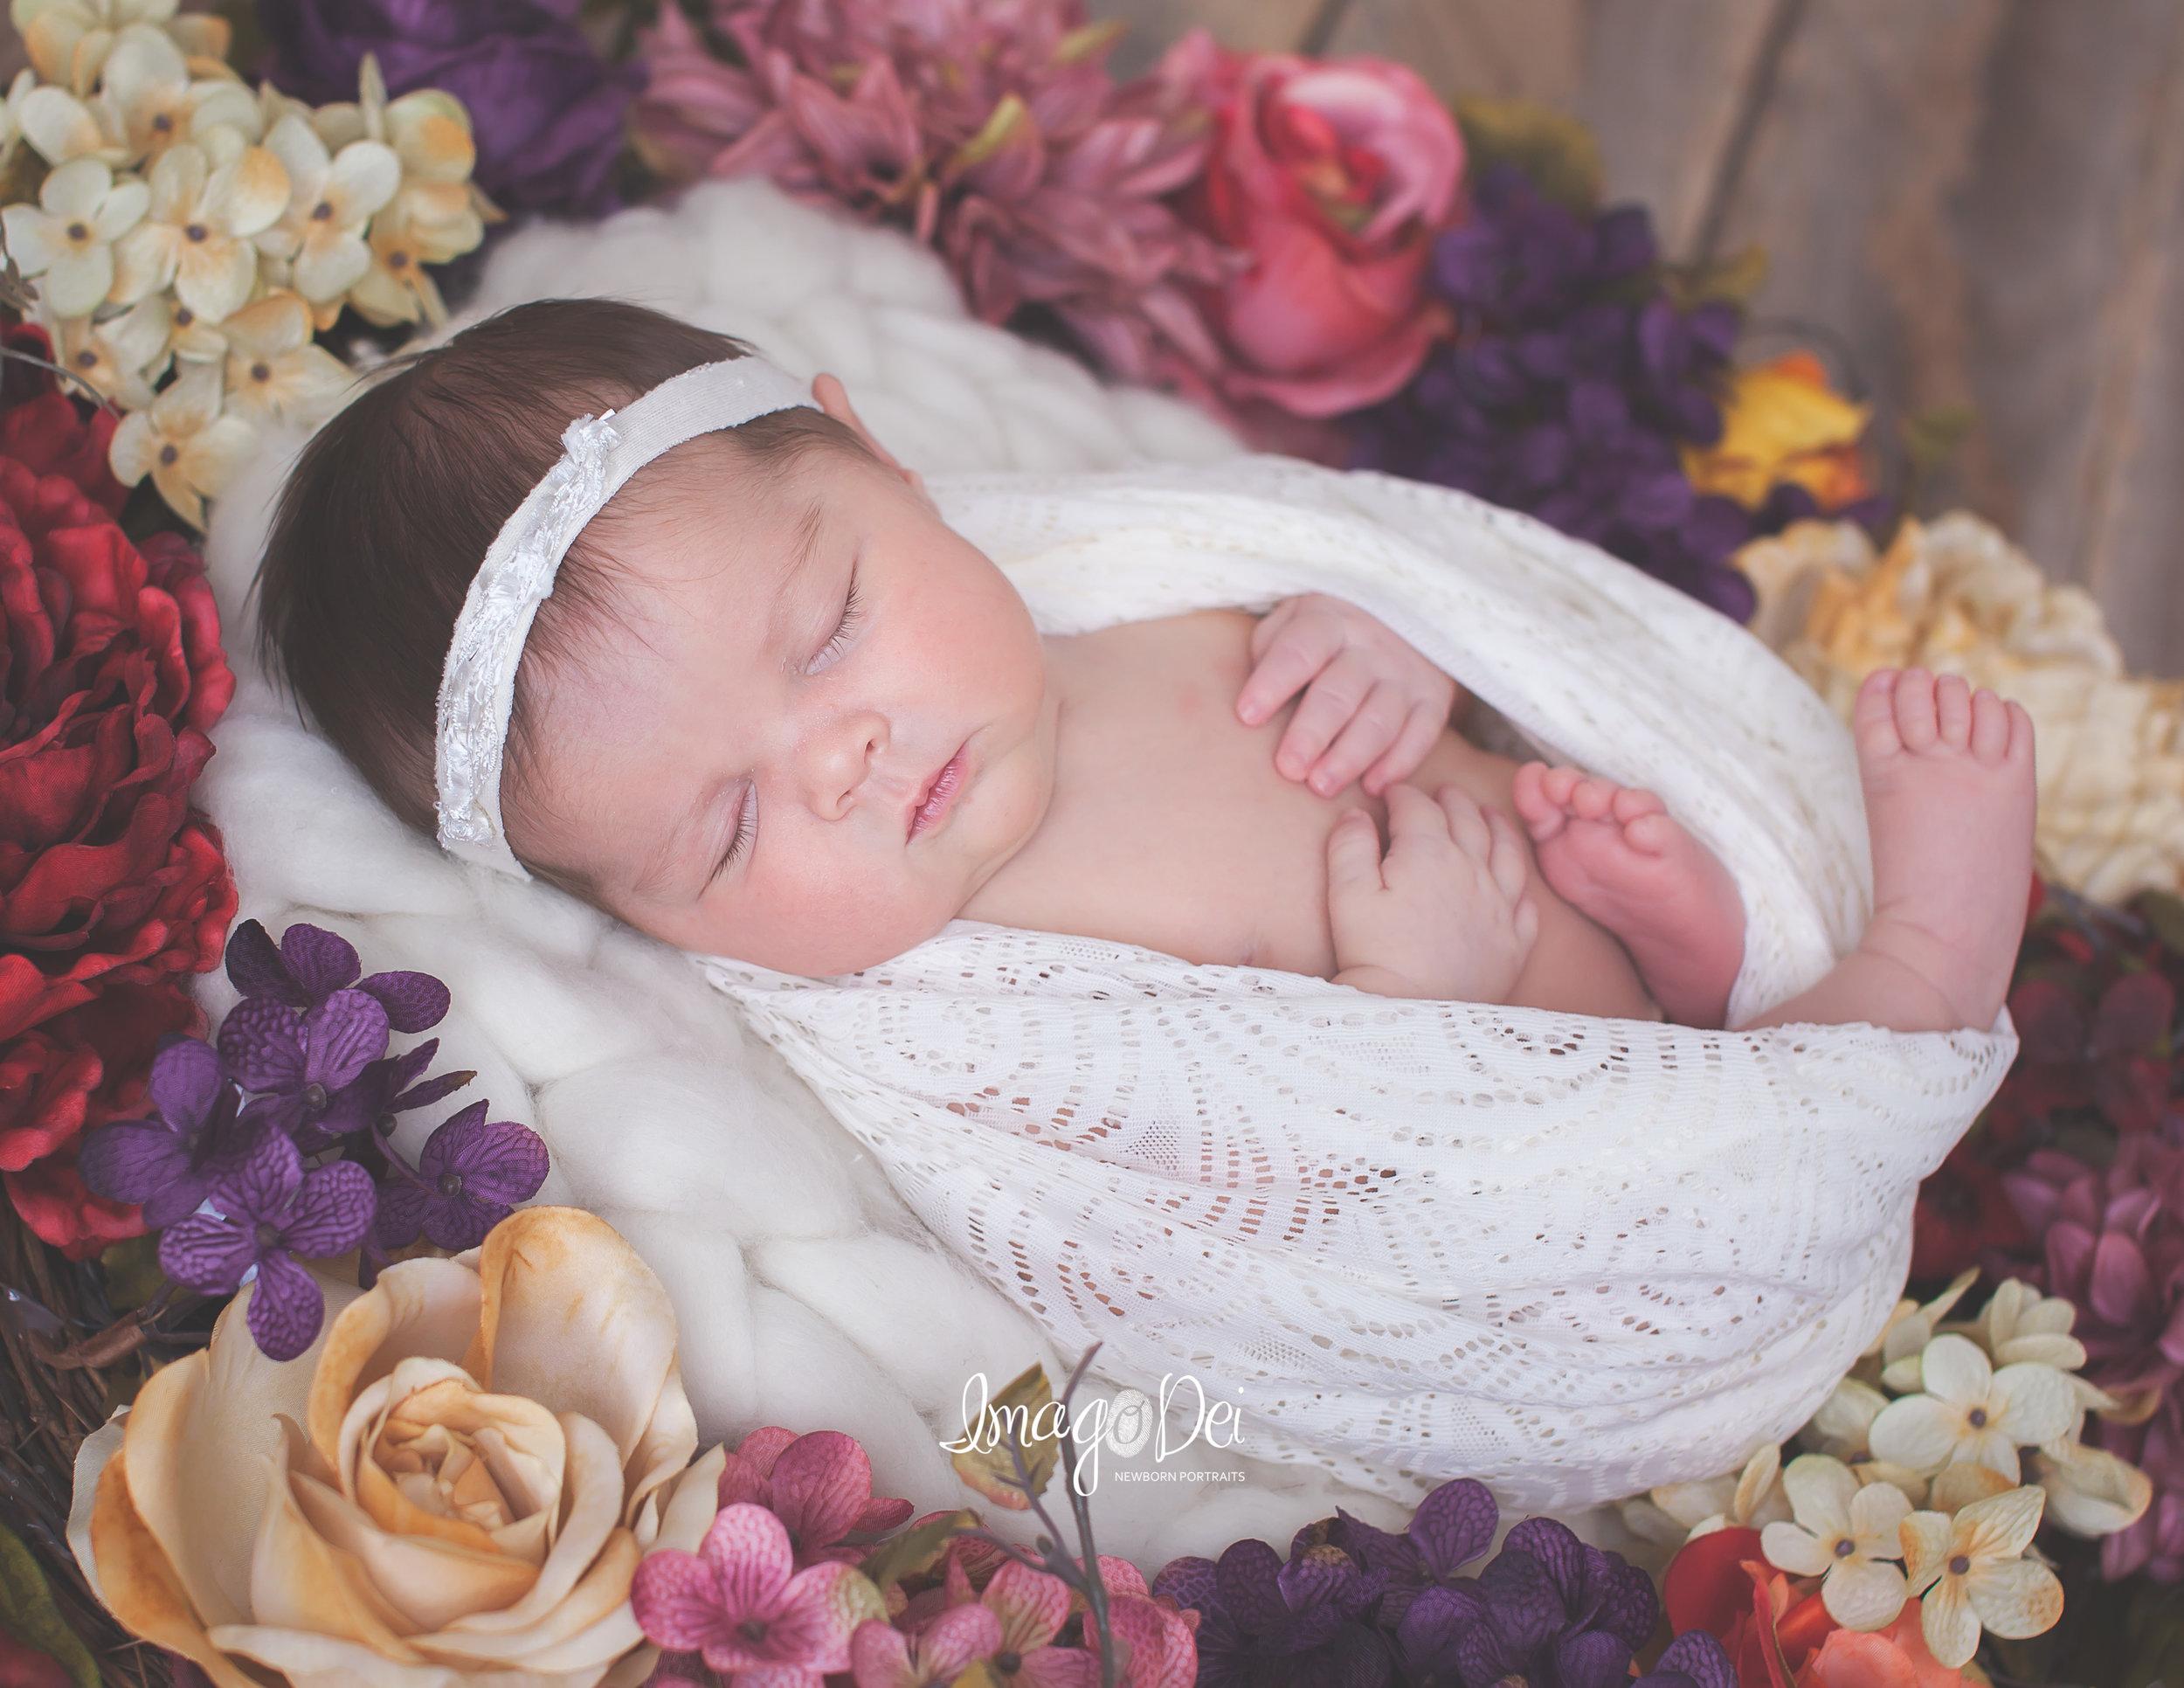 imago-dei-newborn-photography-13